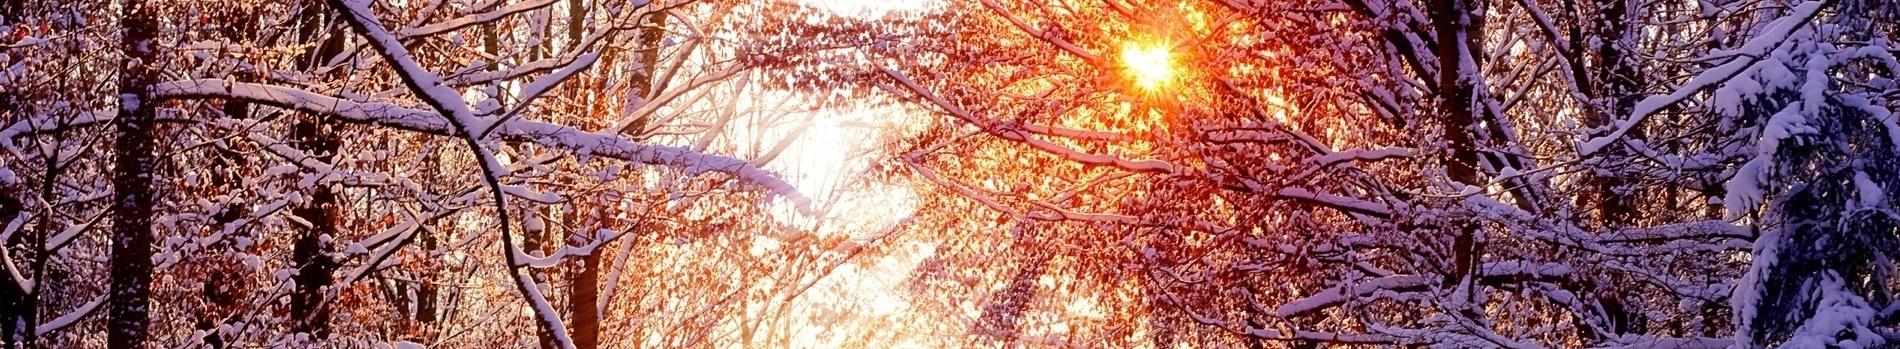 Trees-in-winter-1900x350